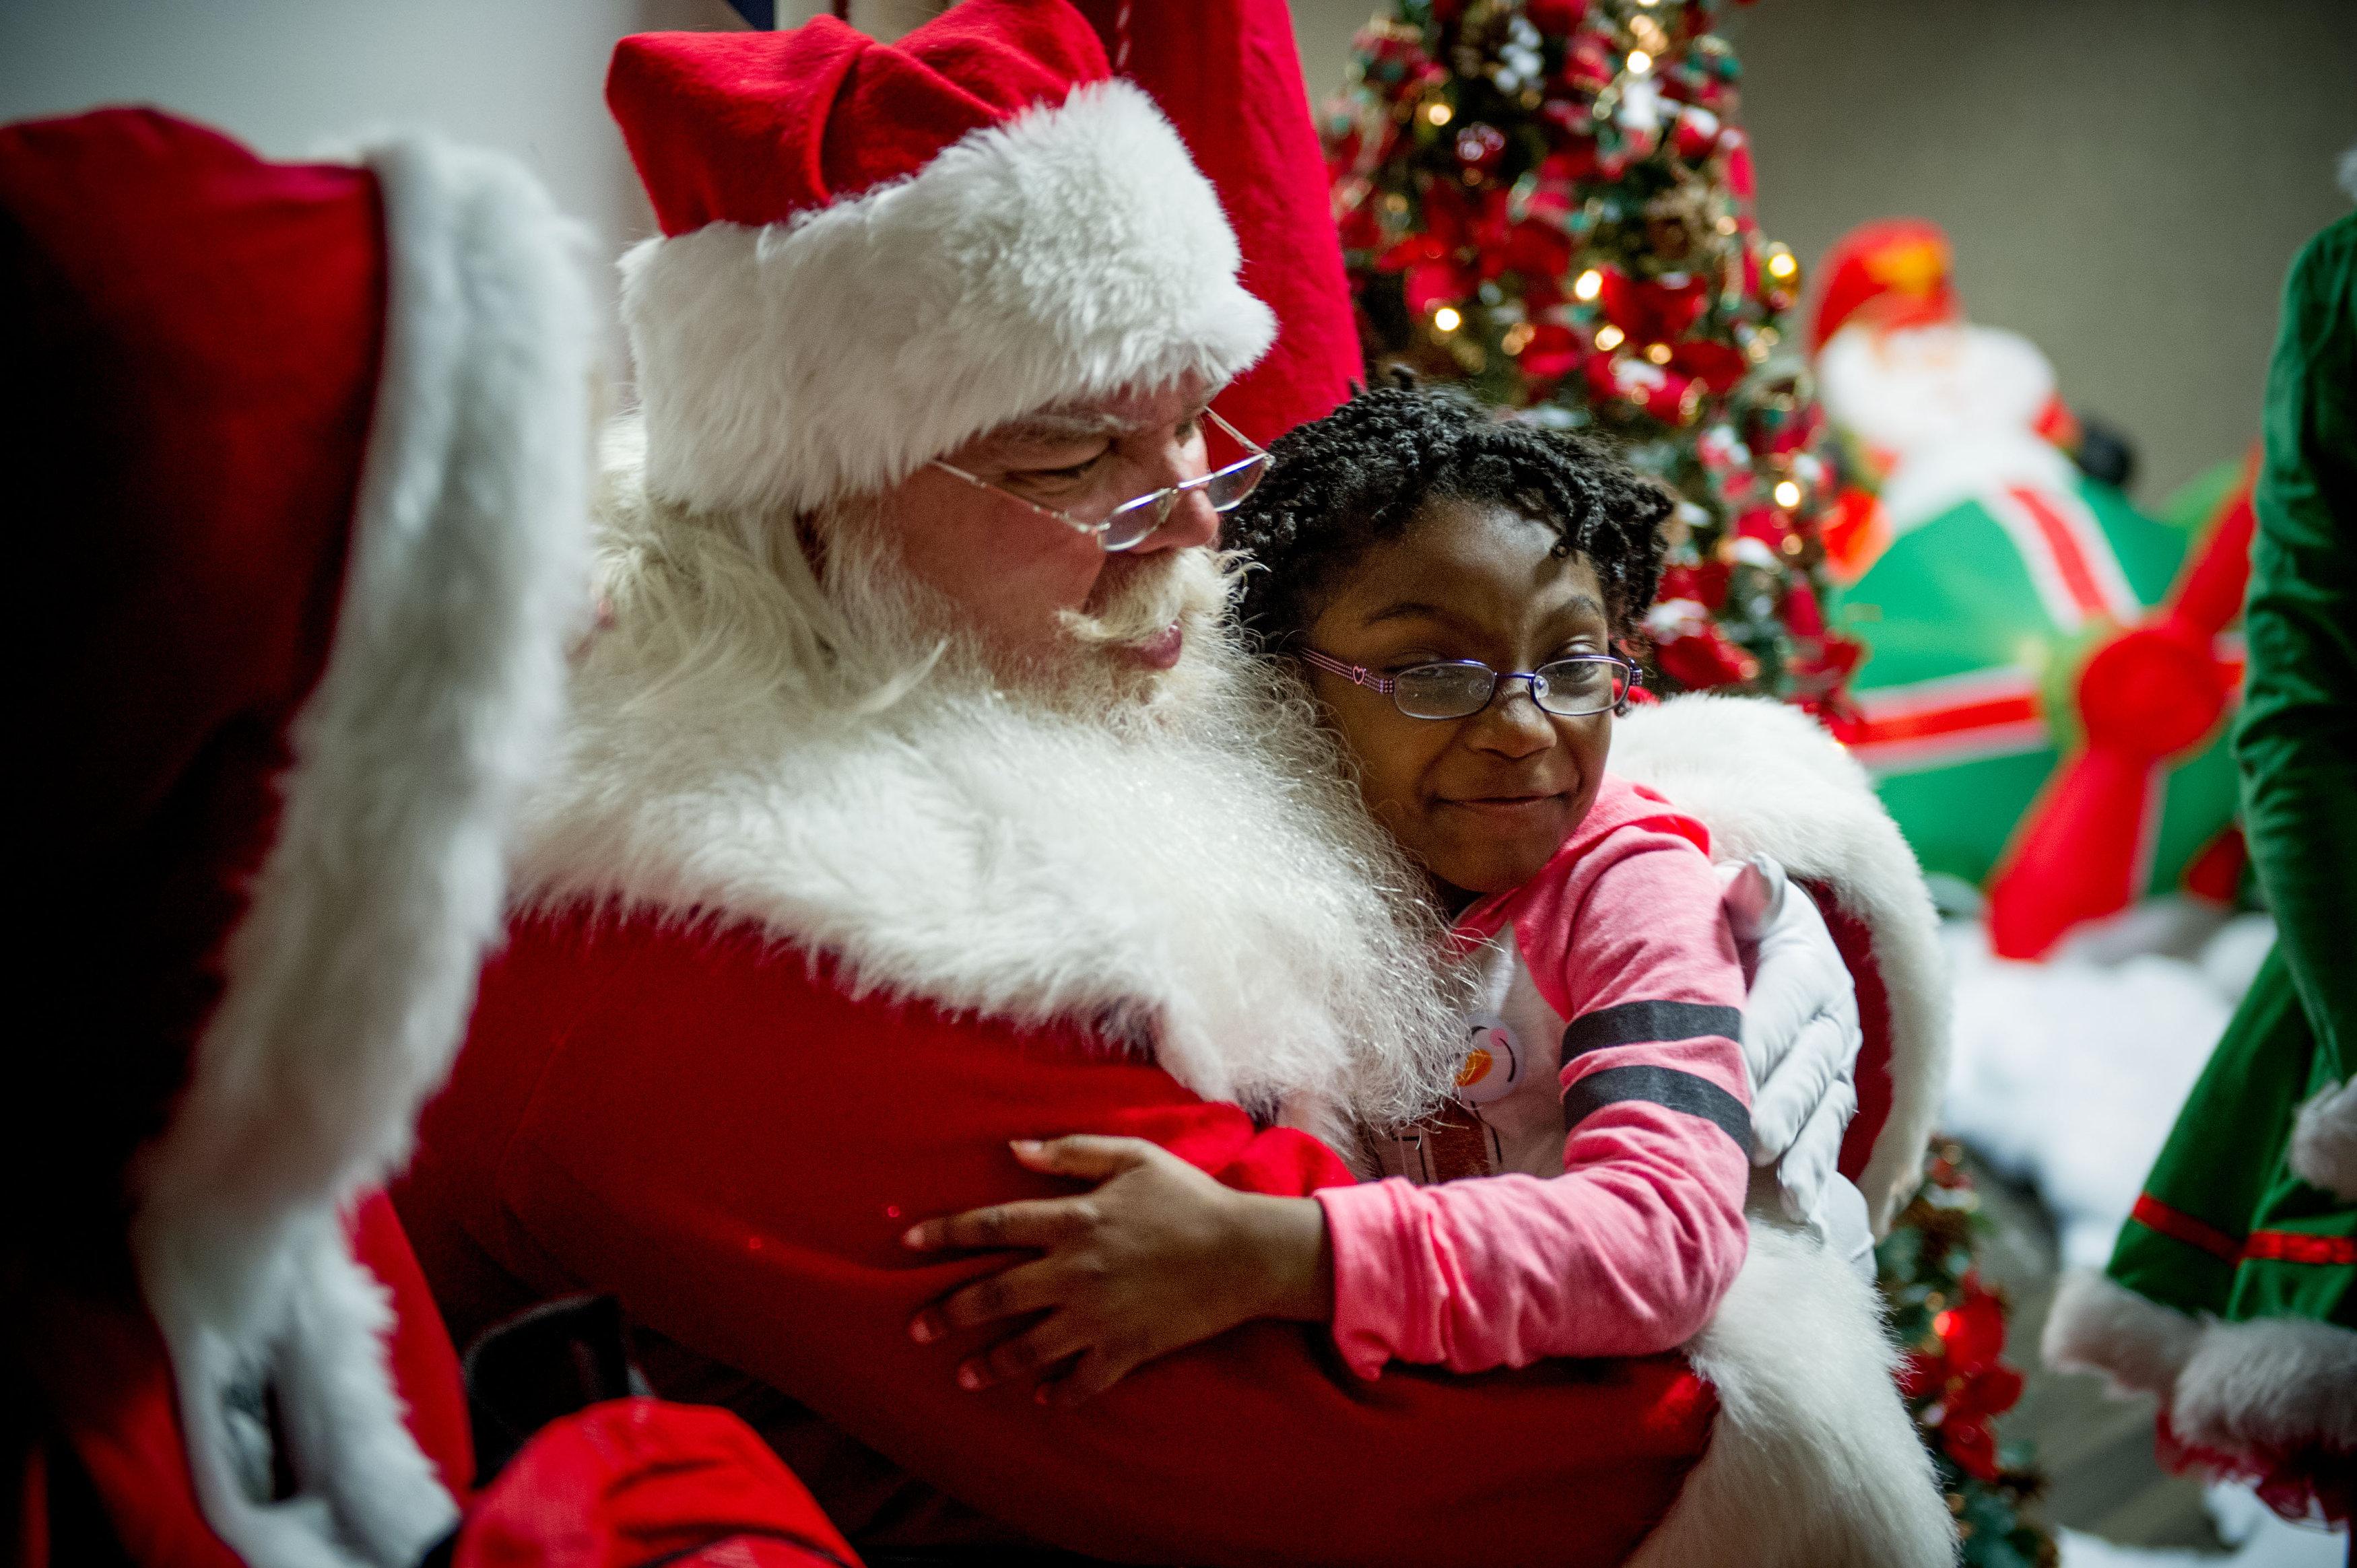 Santa hugging a child